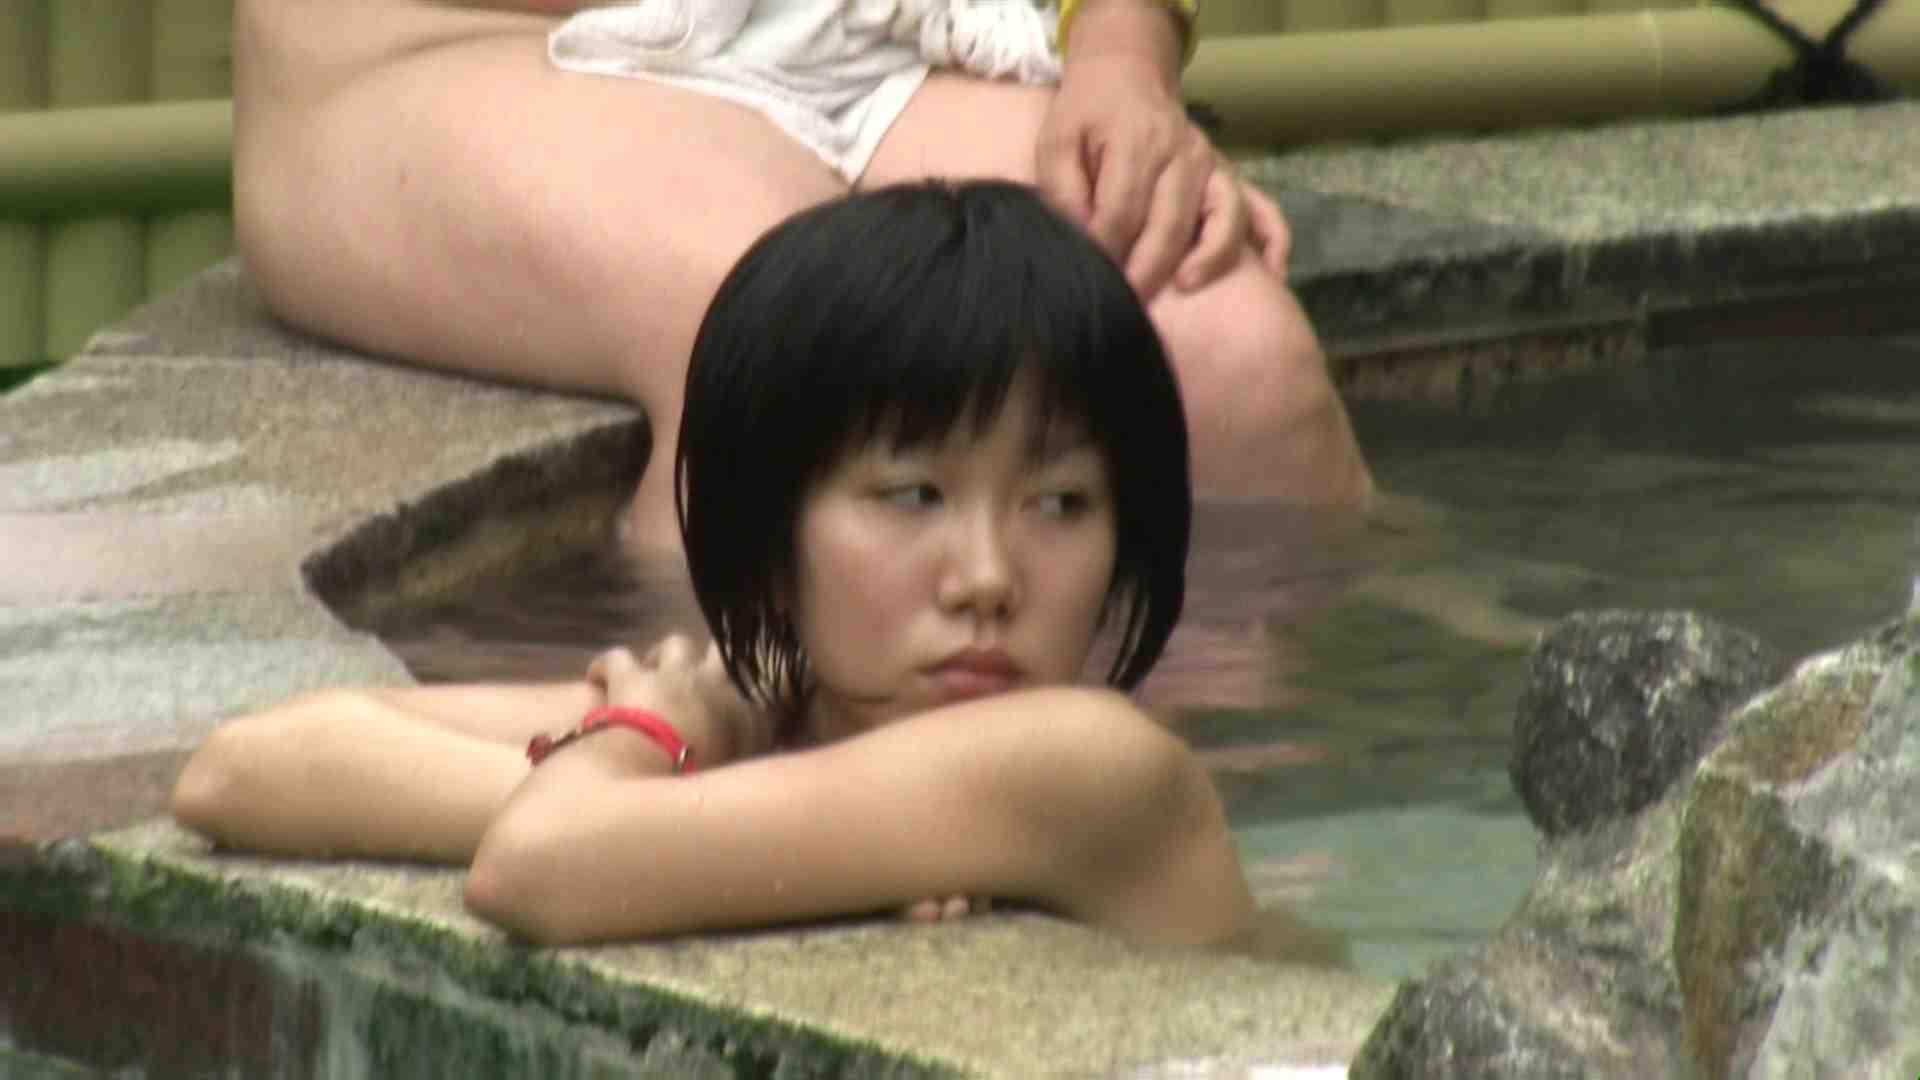 Aquaな露天風呂Vol.37【VIP】 0 | 0  28連発 7